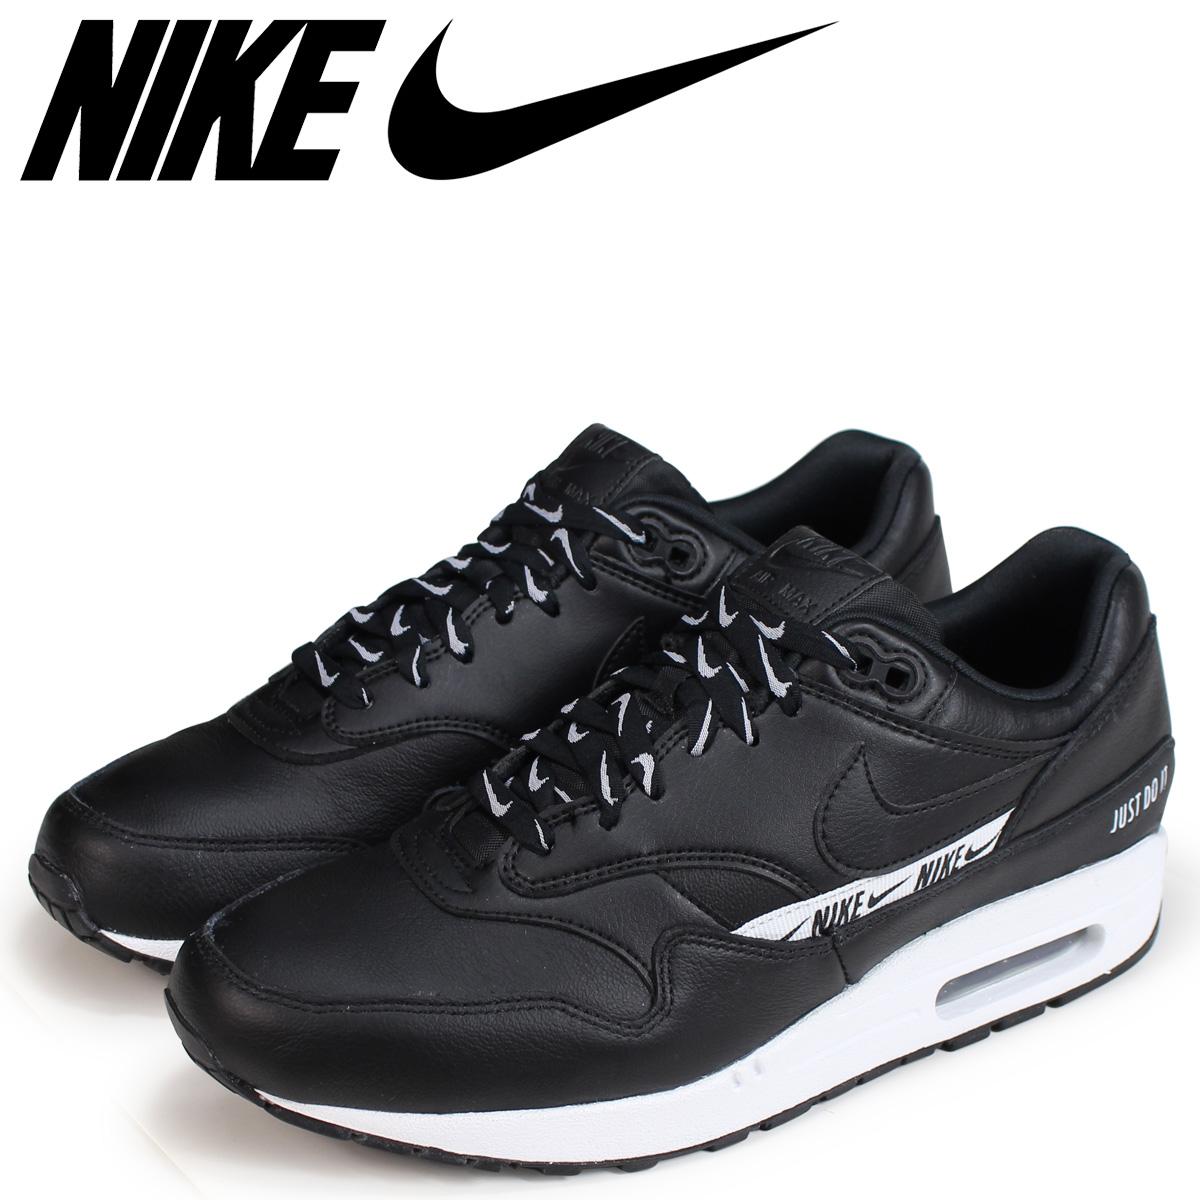 NIKE Kie Ney AMAX 1 sneakers men WMNS AIR MAX 1 SE 881,101 005 black black